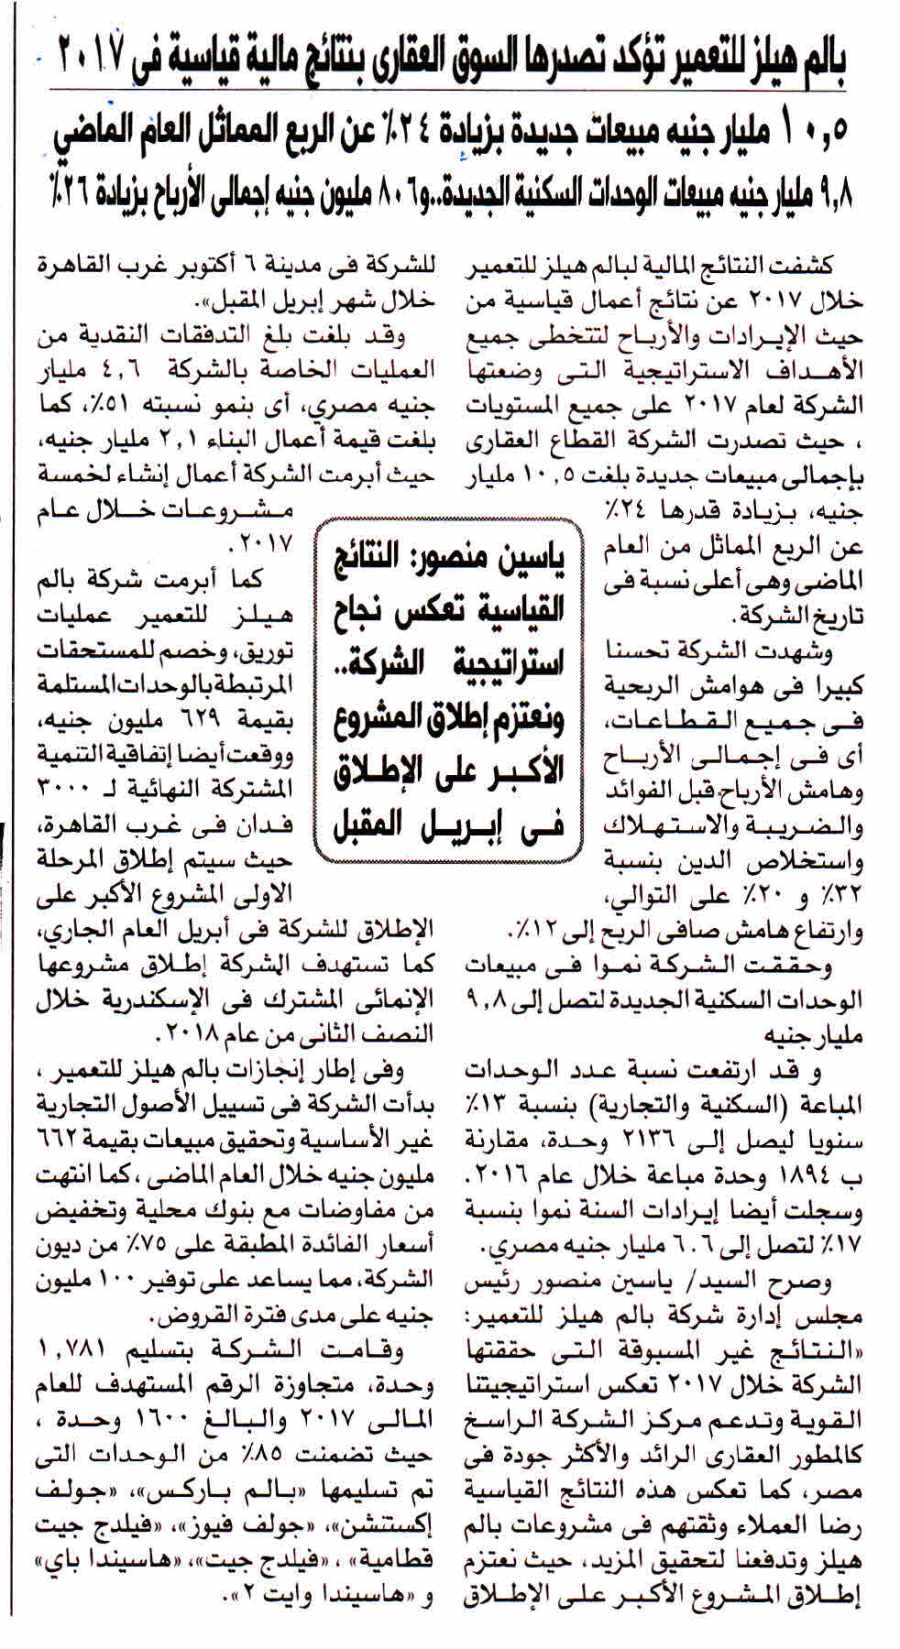 Al Akhbar 28 Feb P.8.jpg